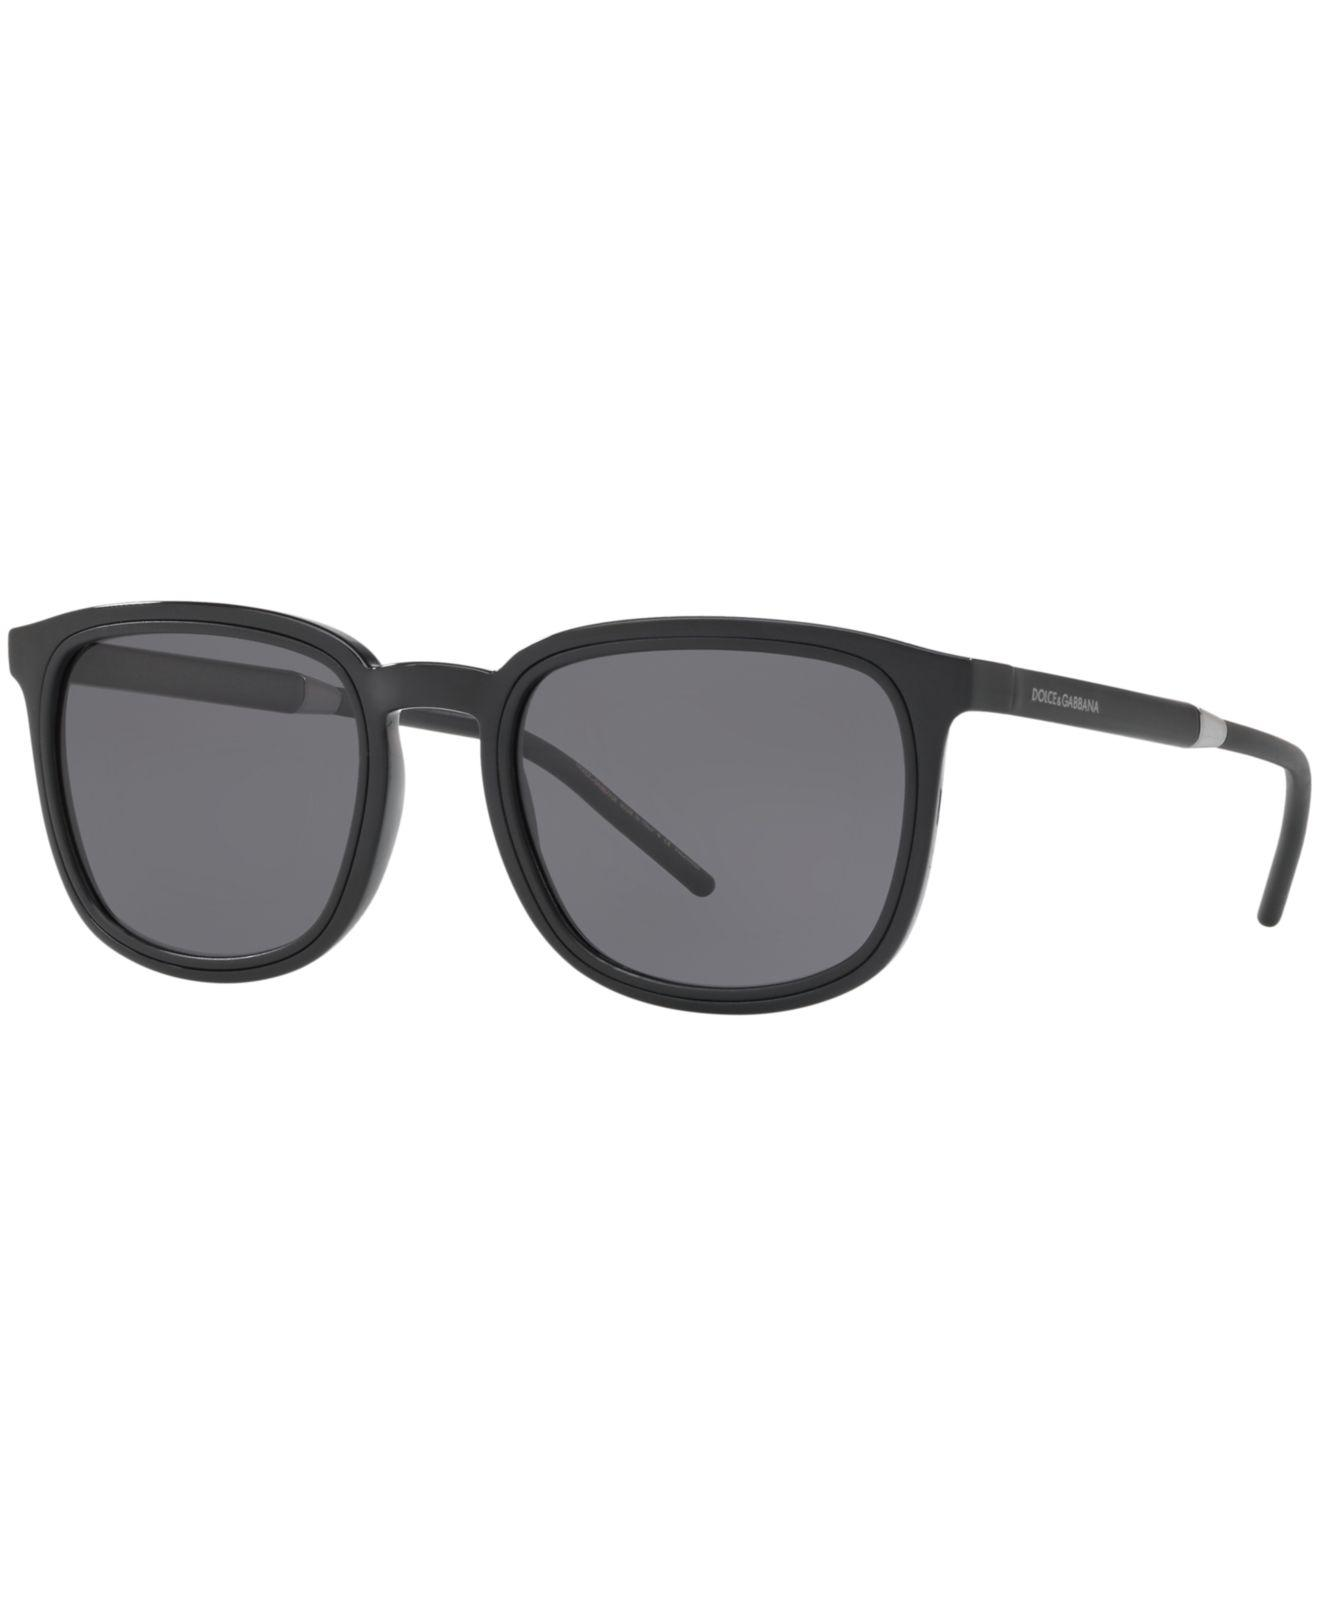 877cea766ad28 Dolce   Gabbana Dg6115 in Black for Men - Lyst